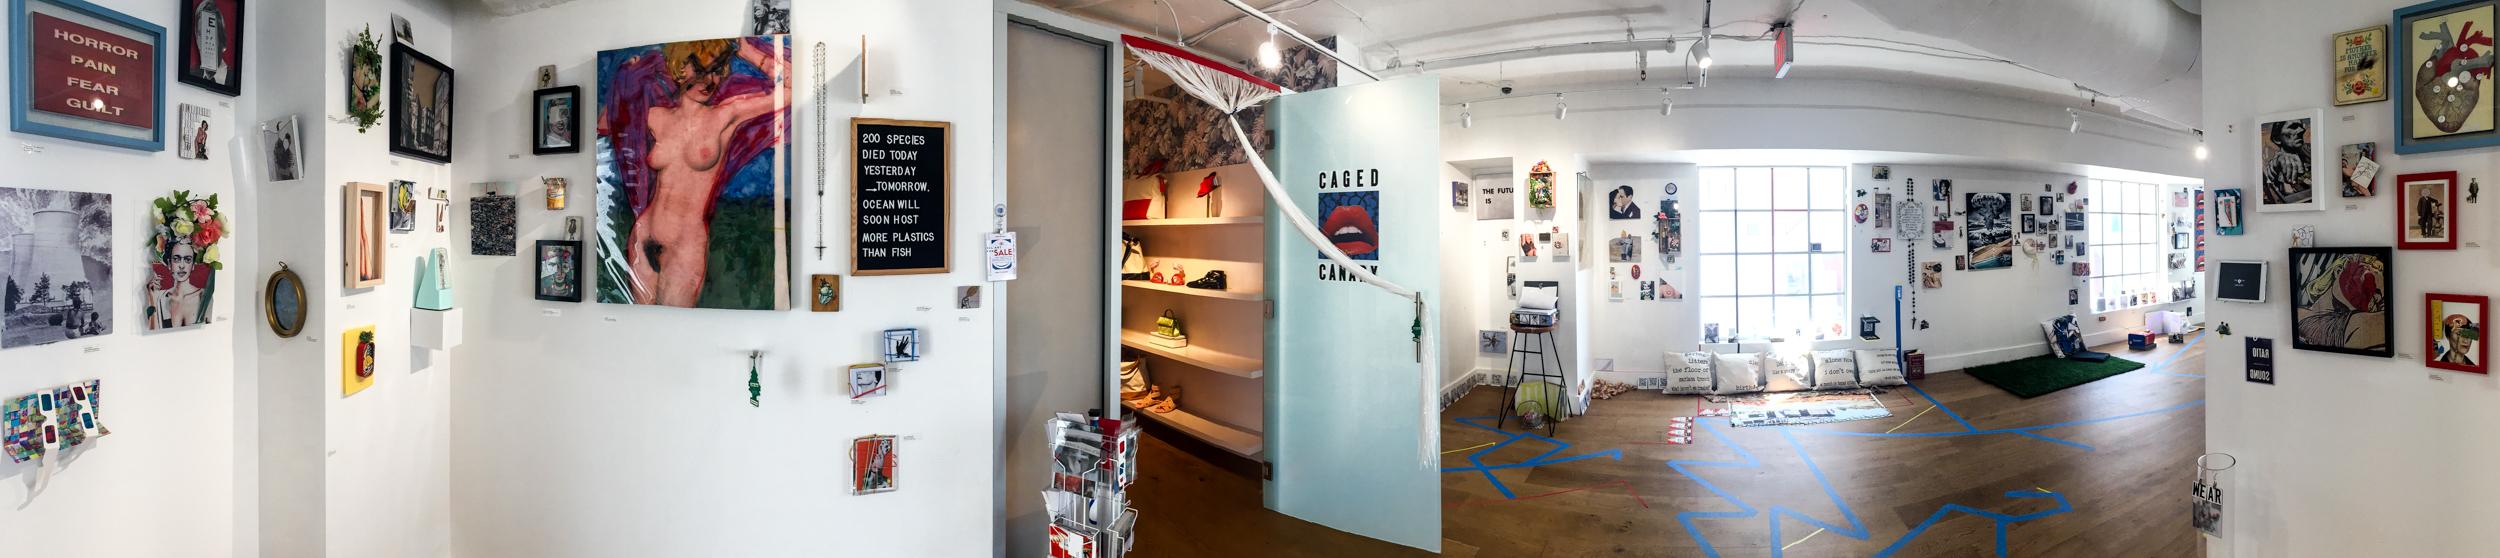 Faena-Exhibition-Images-136.jpg